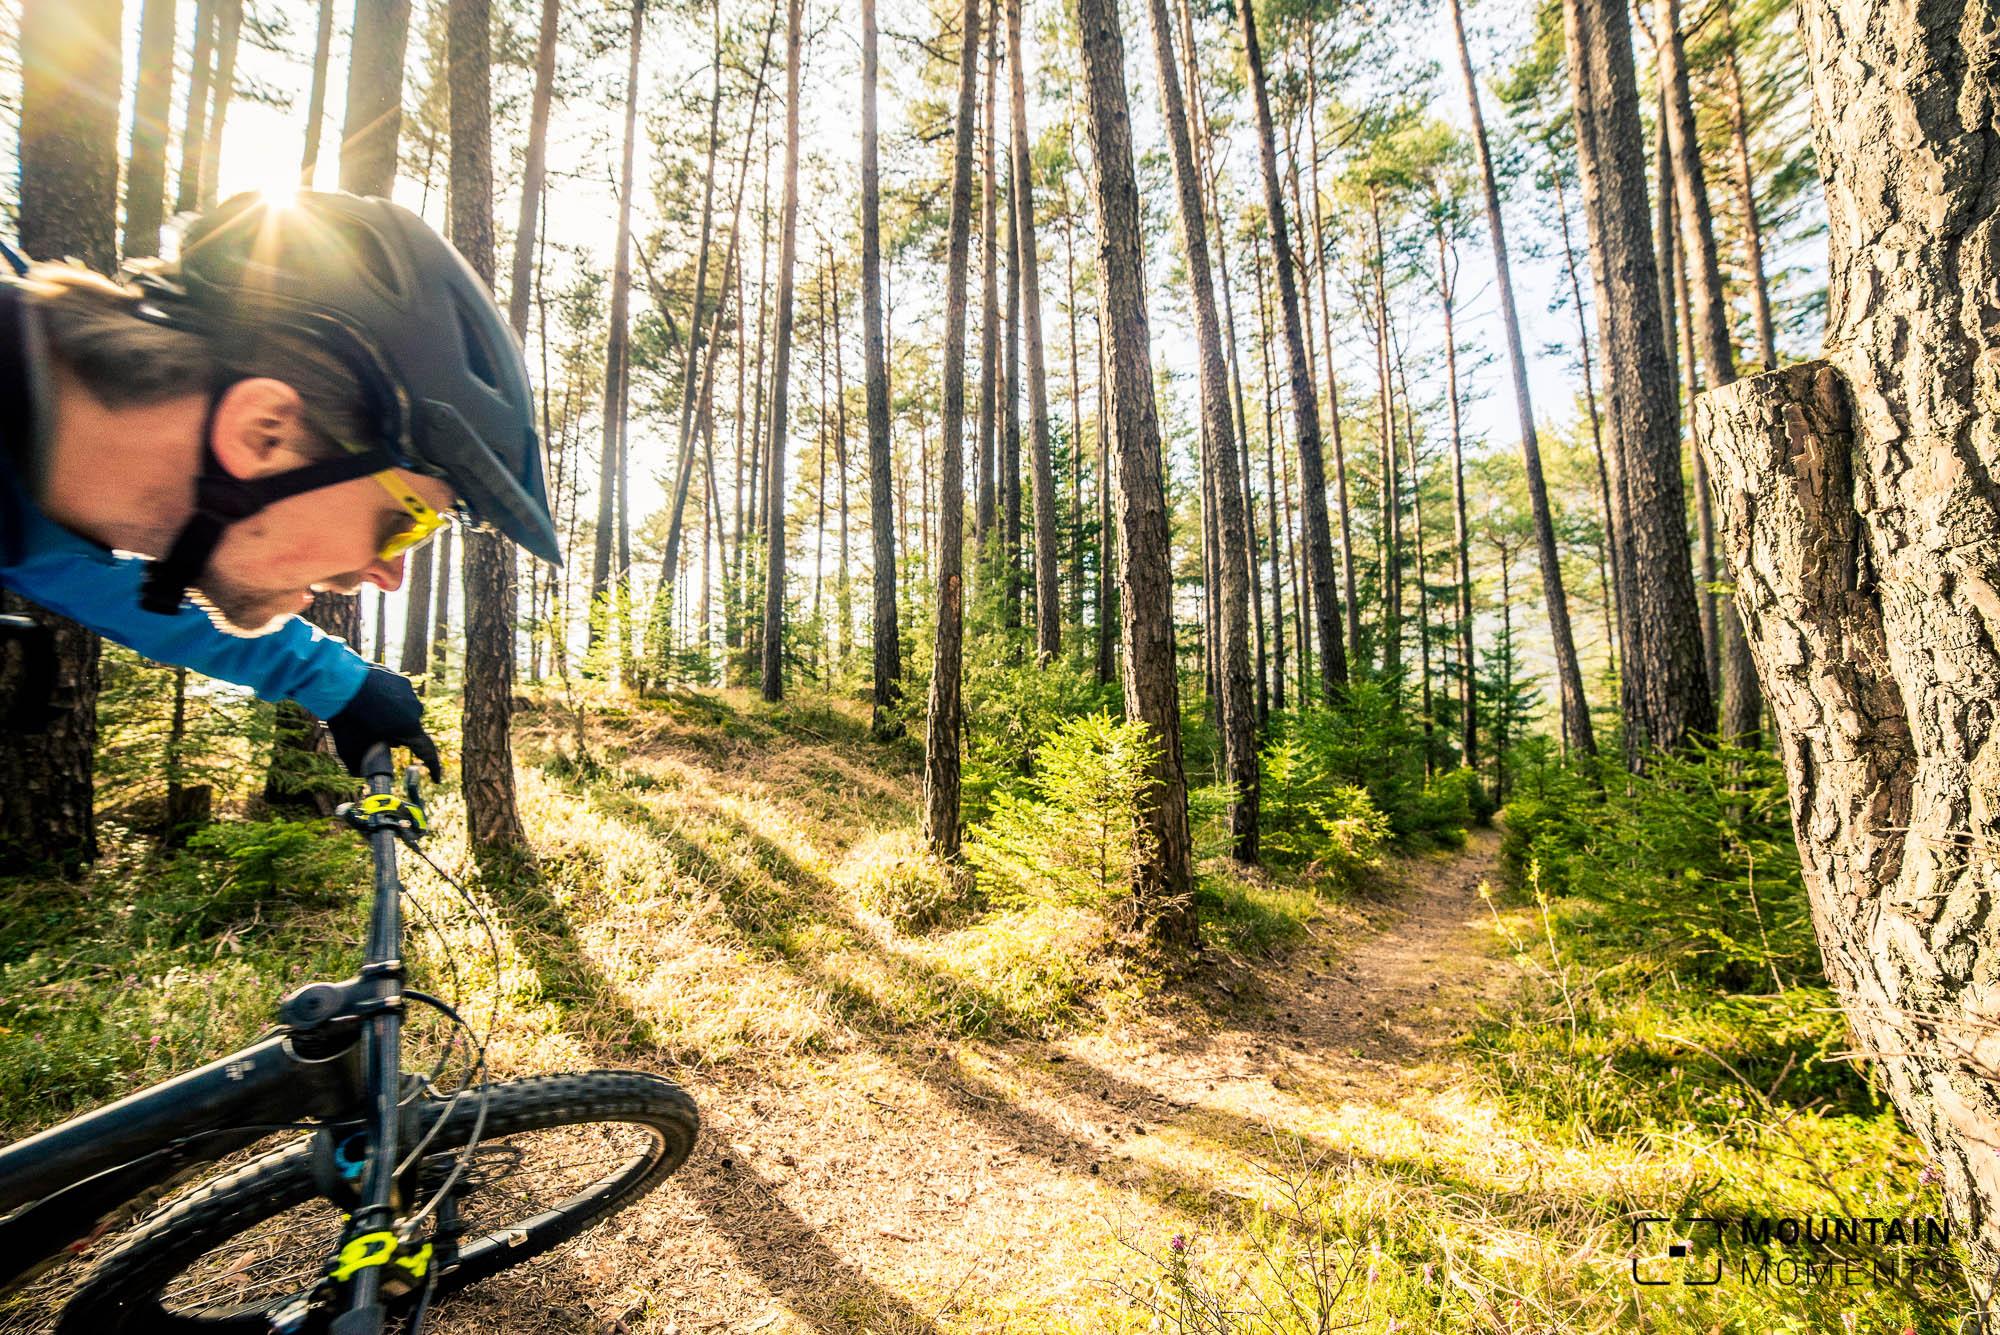 bergfotografie tipps, actionbilder tipps, bikefoto tipps, bikefotografie lernen, actionfotografie lernen